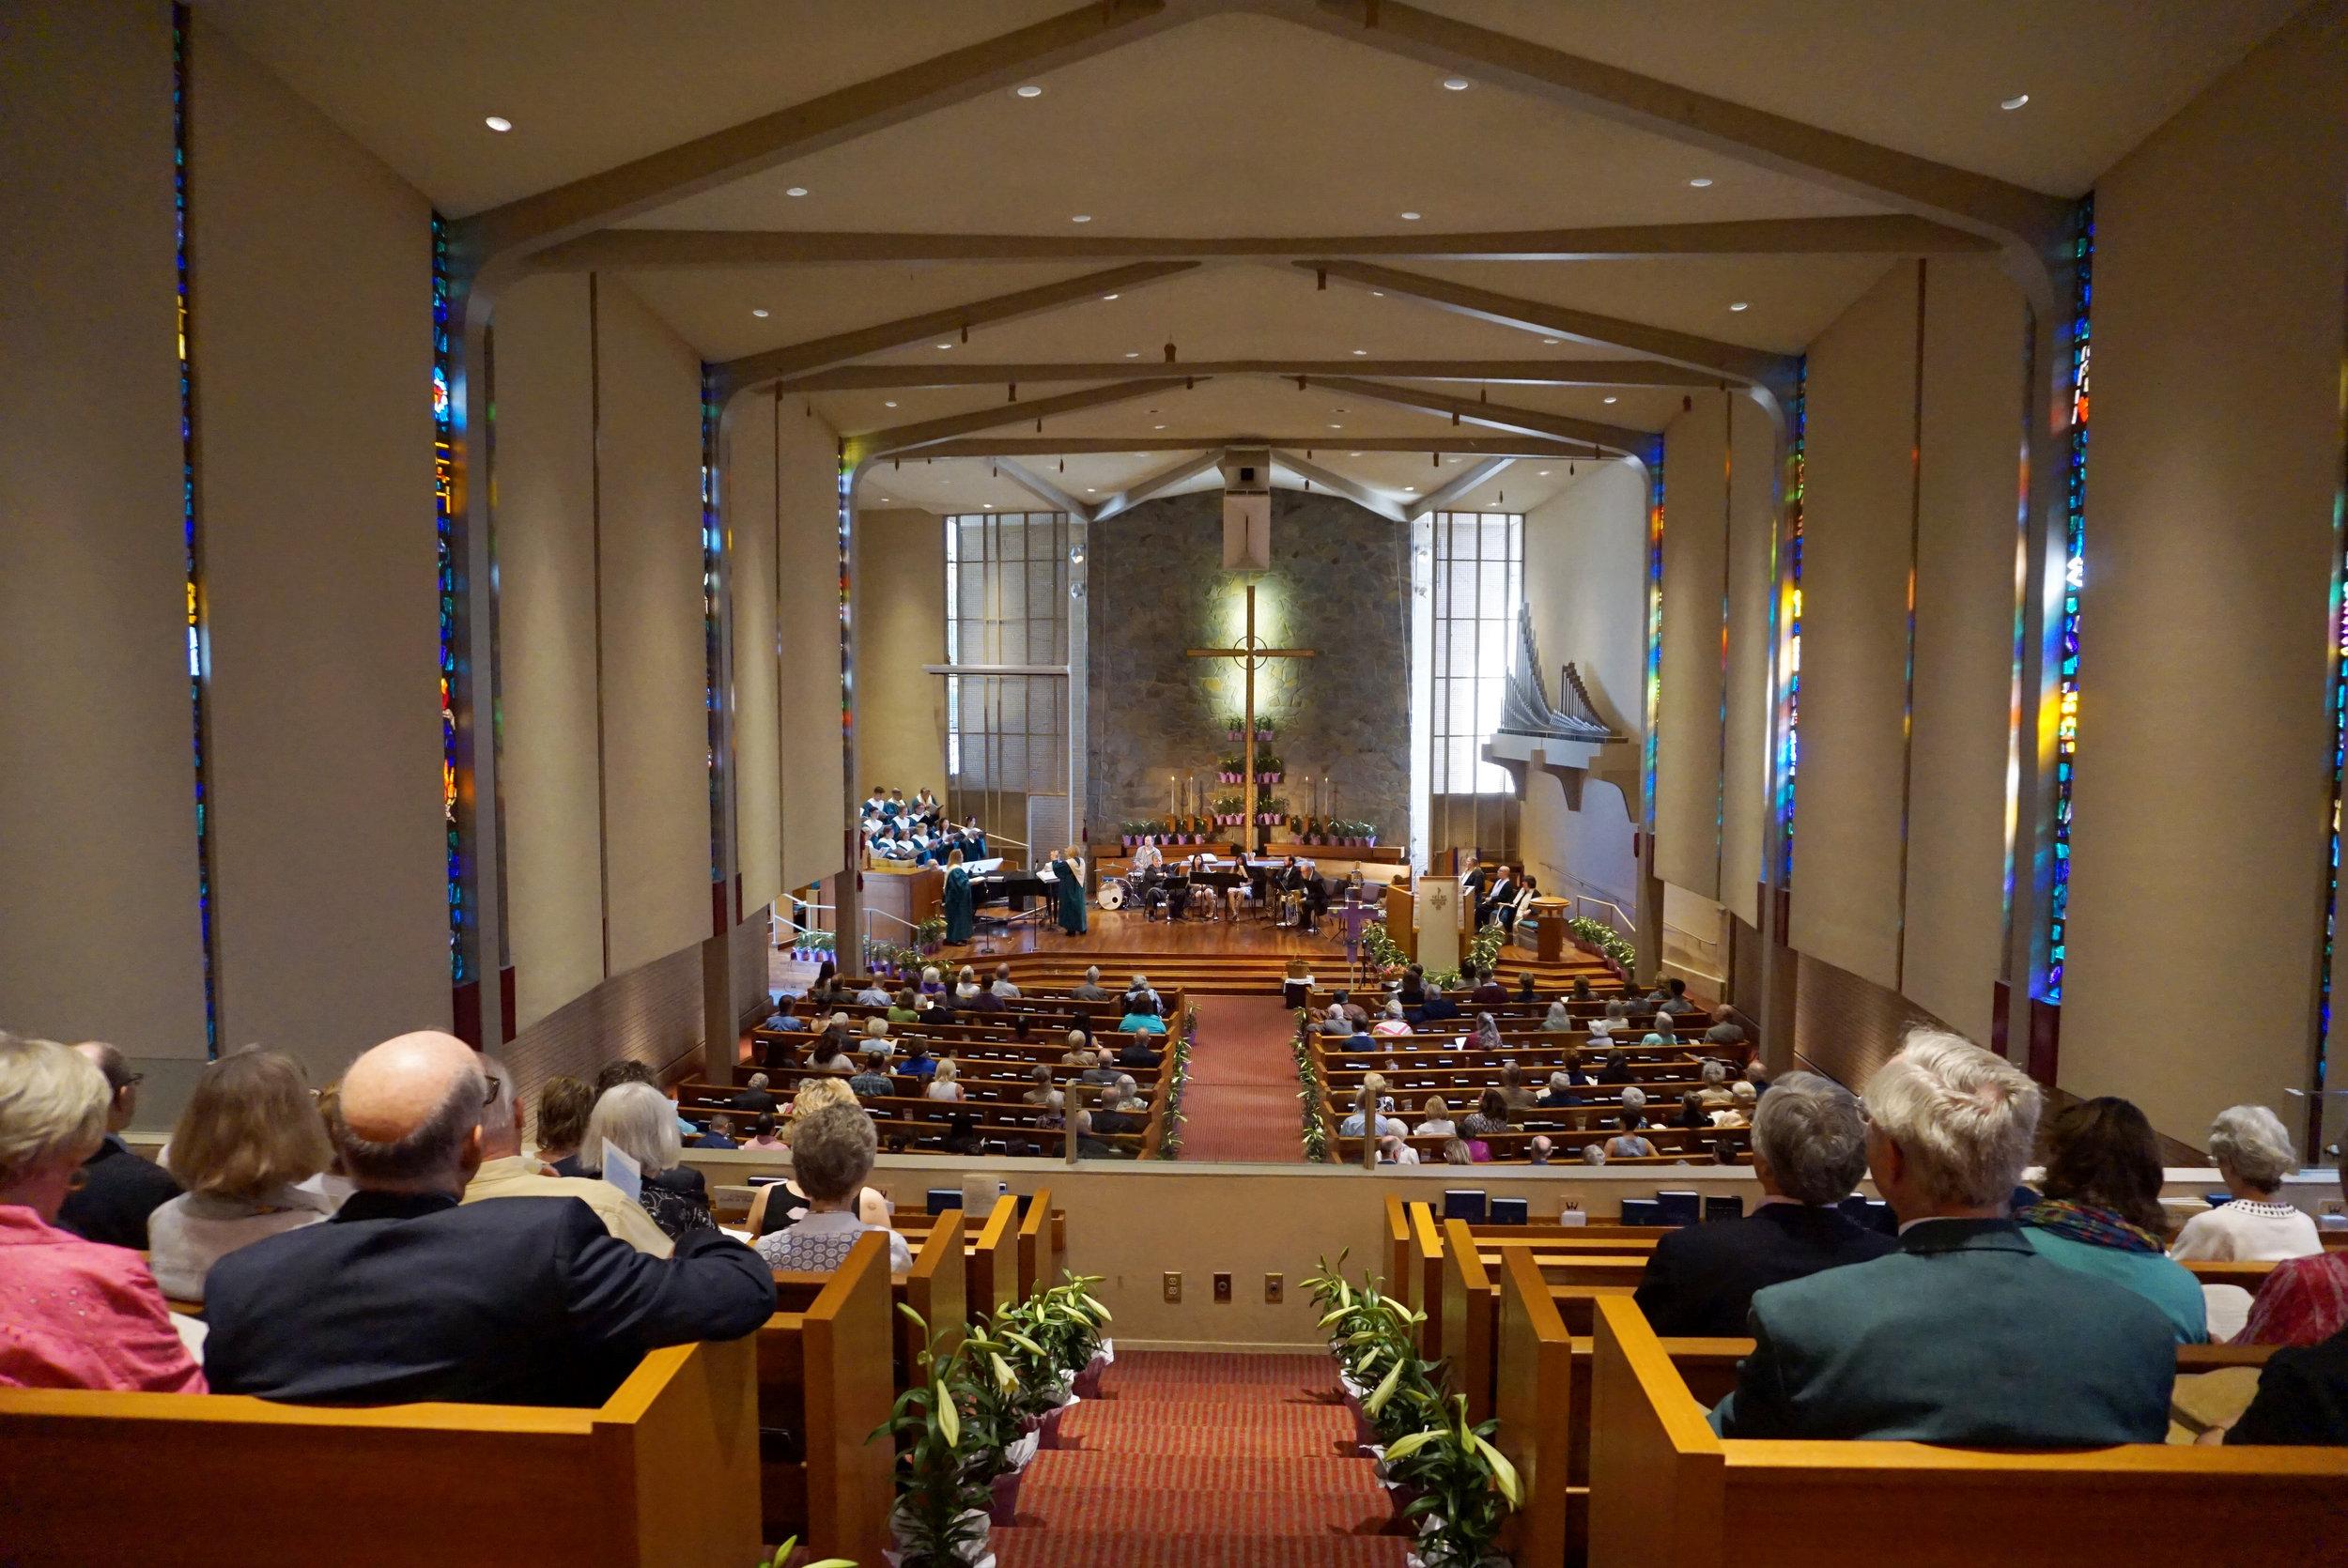 Claremont-Presbyterian-Church-Congregation-19.jpg